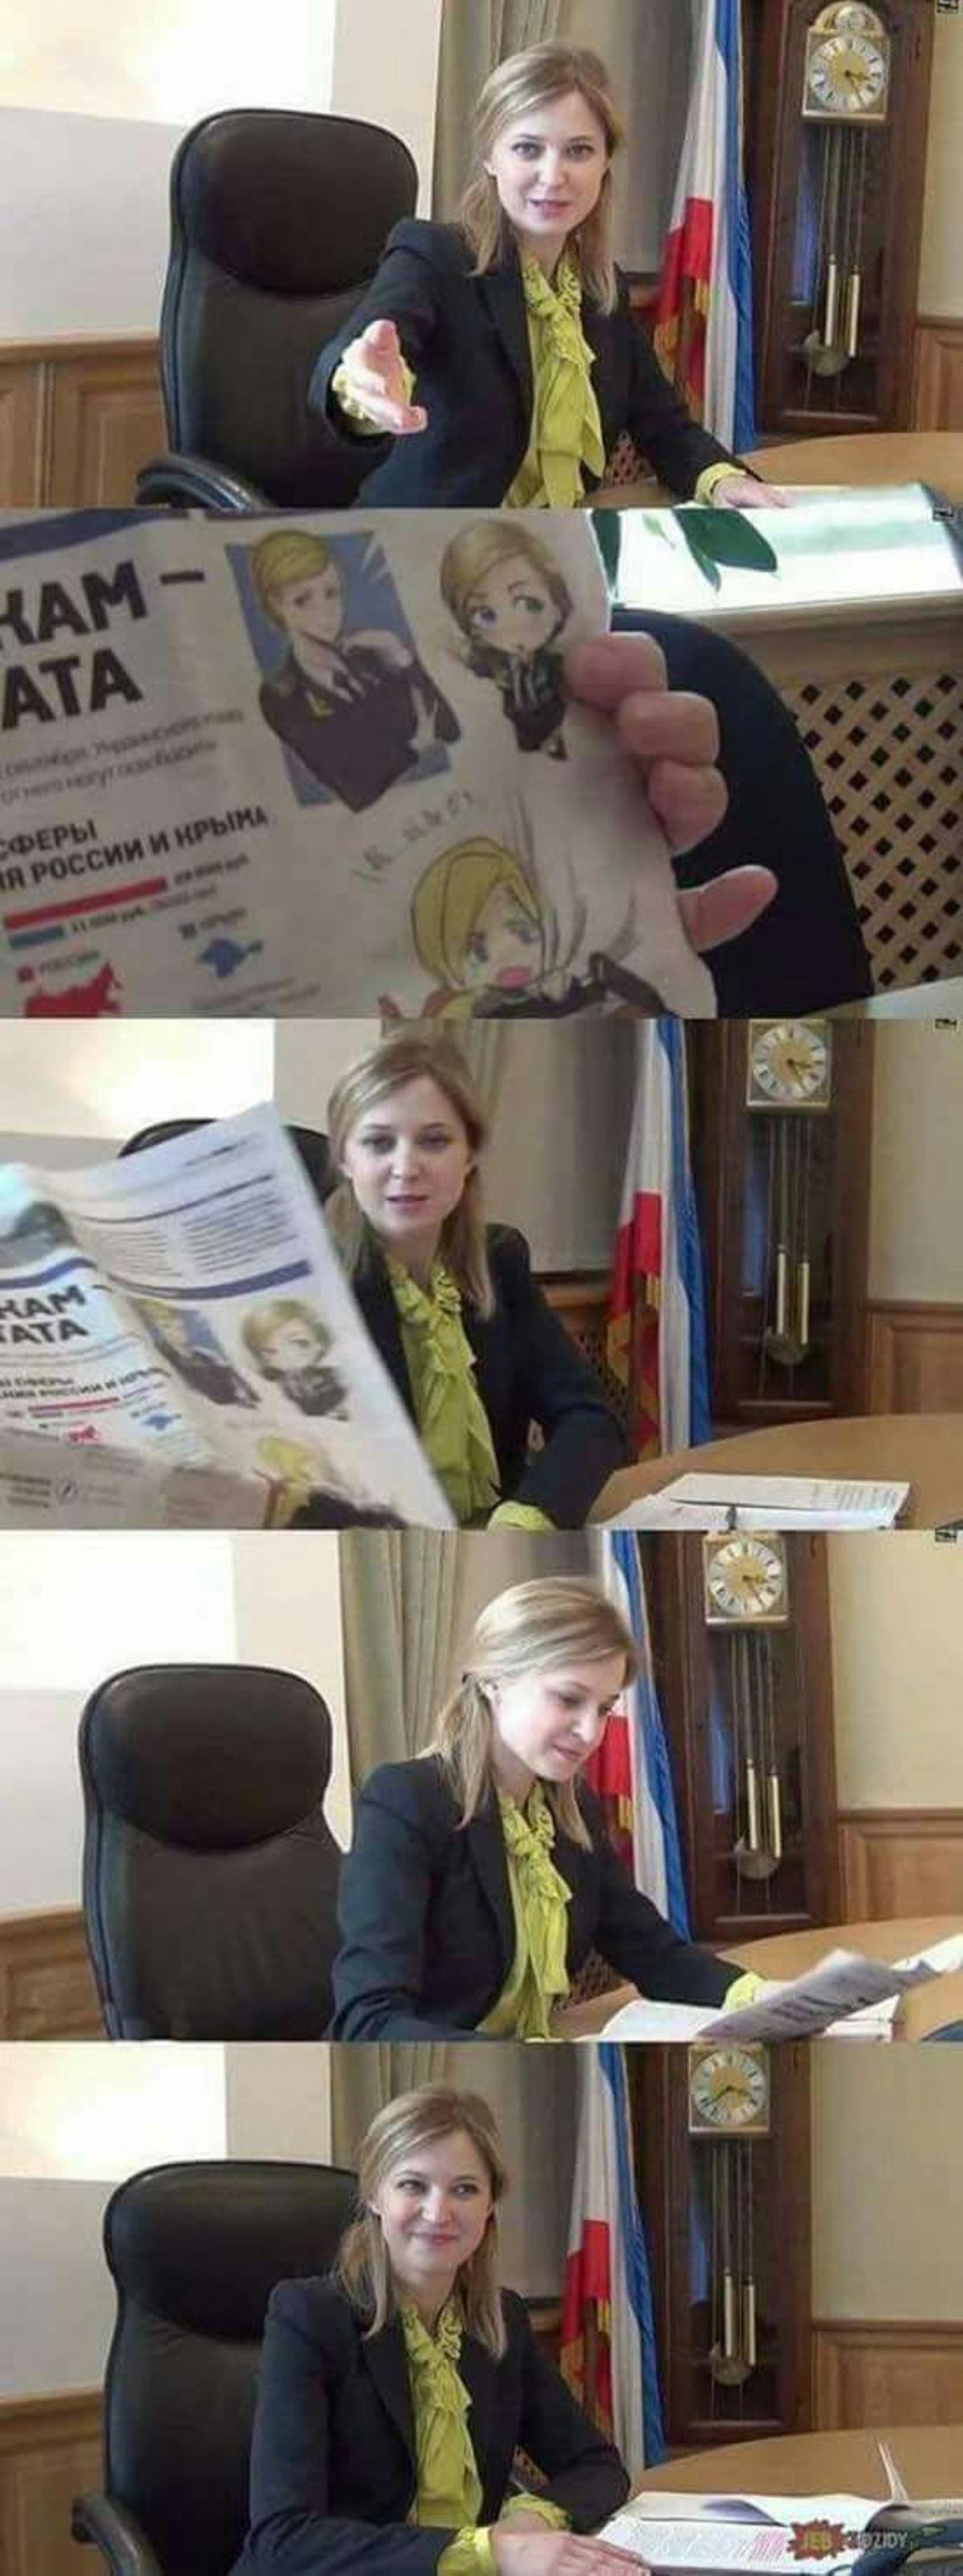 Natalia Poklonskaya. .. I had hope that she will say: A goo! kawaii desu! But she was like: I'm real person, not a cartoon. Natalia Poklonskaya I had hope that she will say: A goo! kawaii desu! But was like: I'm real person not a cartoon